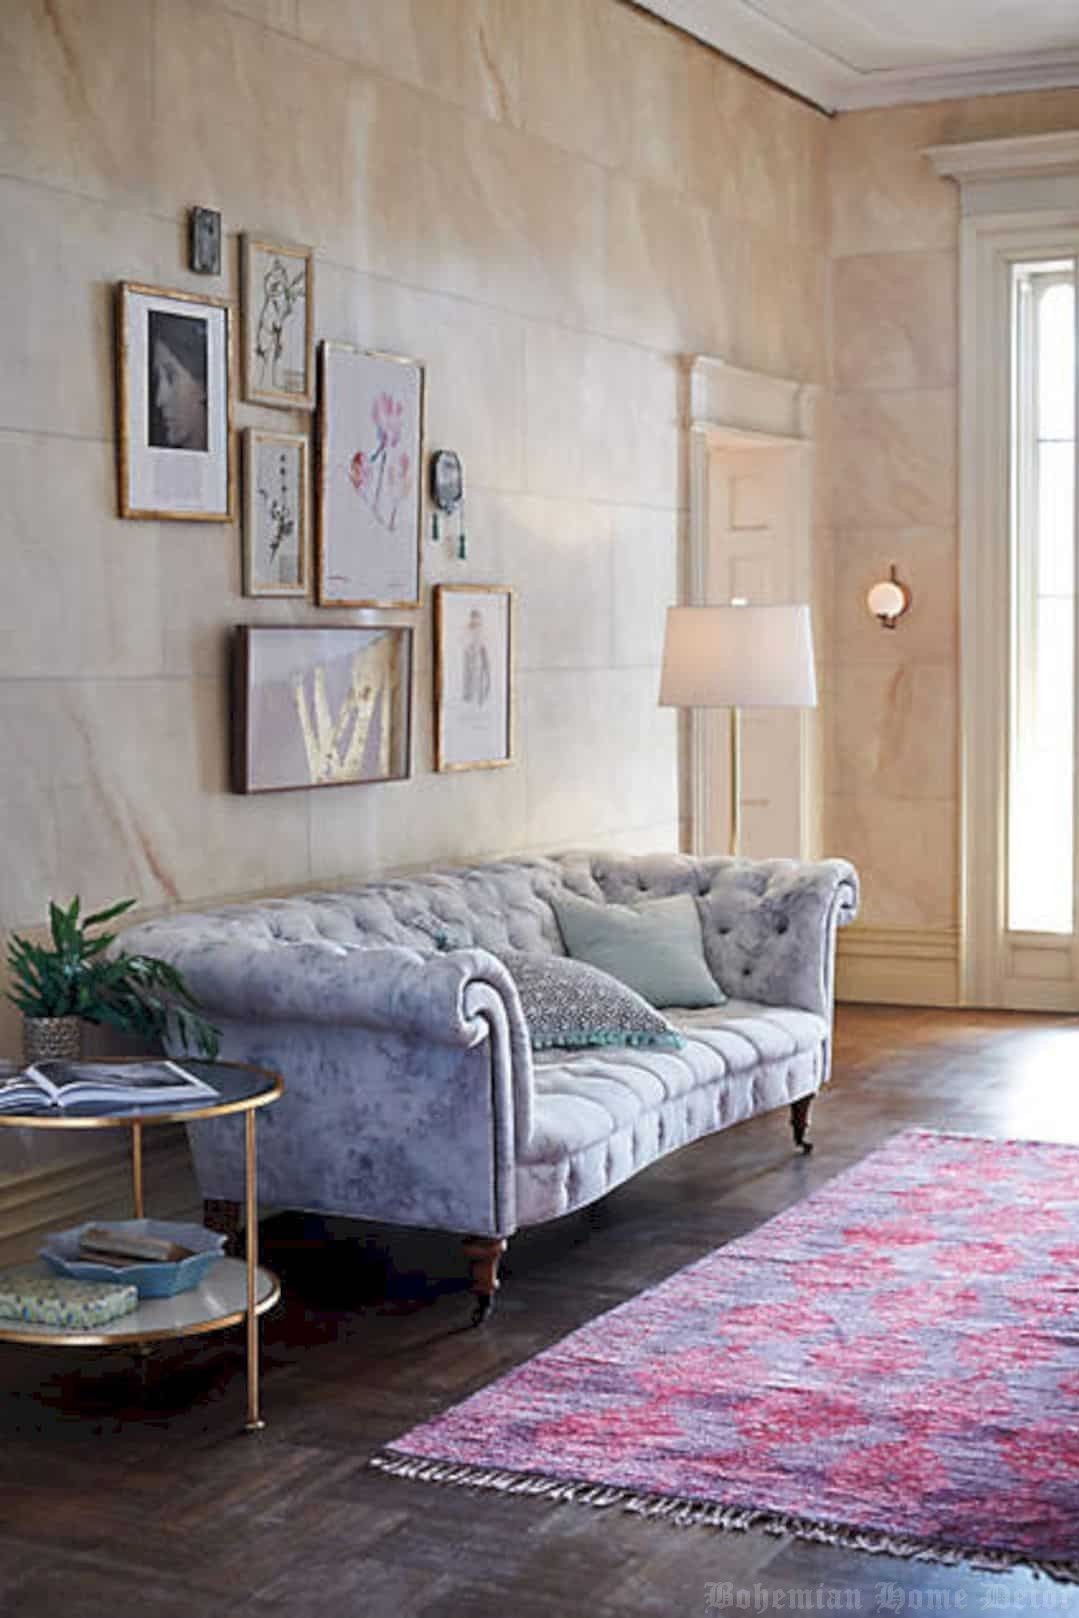 10 Step Checklist for Bohemian Home Decor